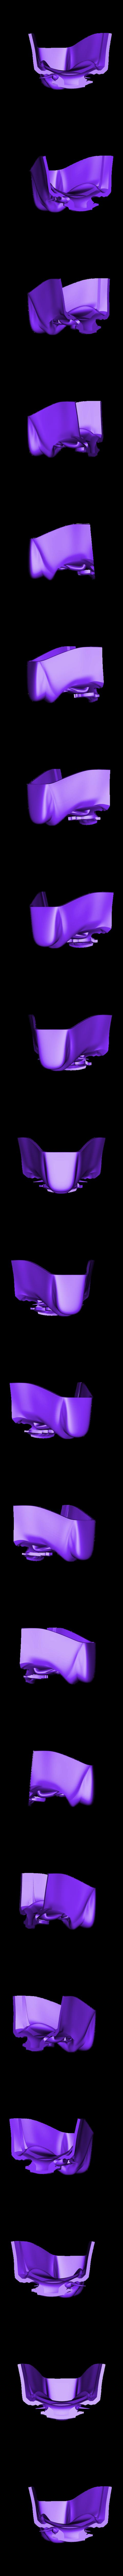 Hannya_Mask_4CD.stl Download free STL file Hannya Mask Rurouni Kenshin (Ninja) • Model to 3D print, VillainousPropShop